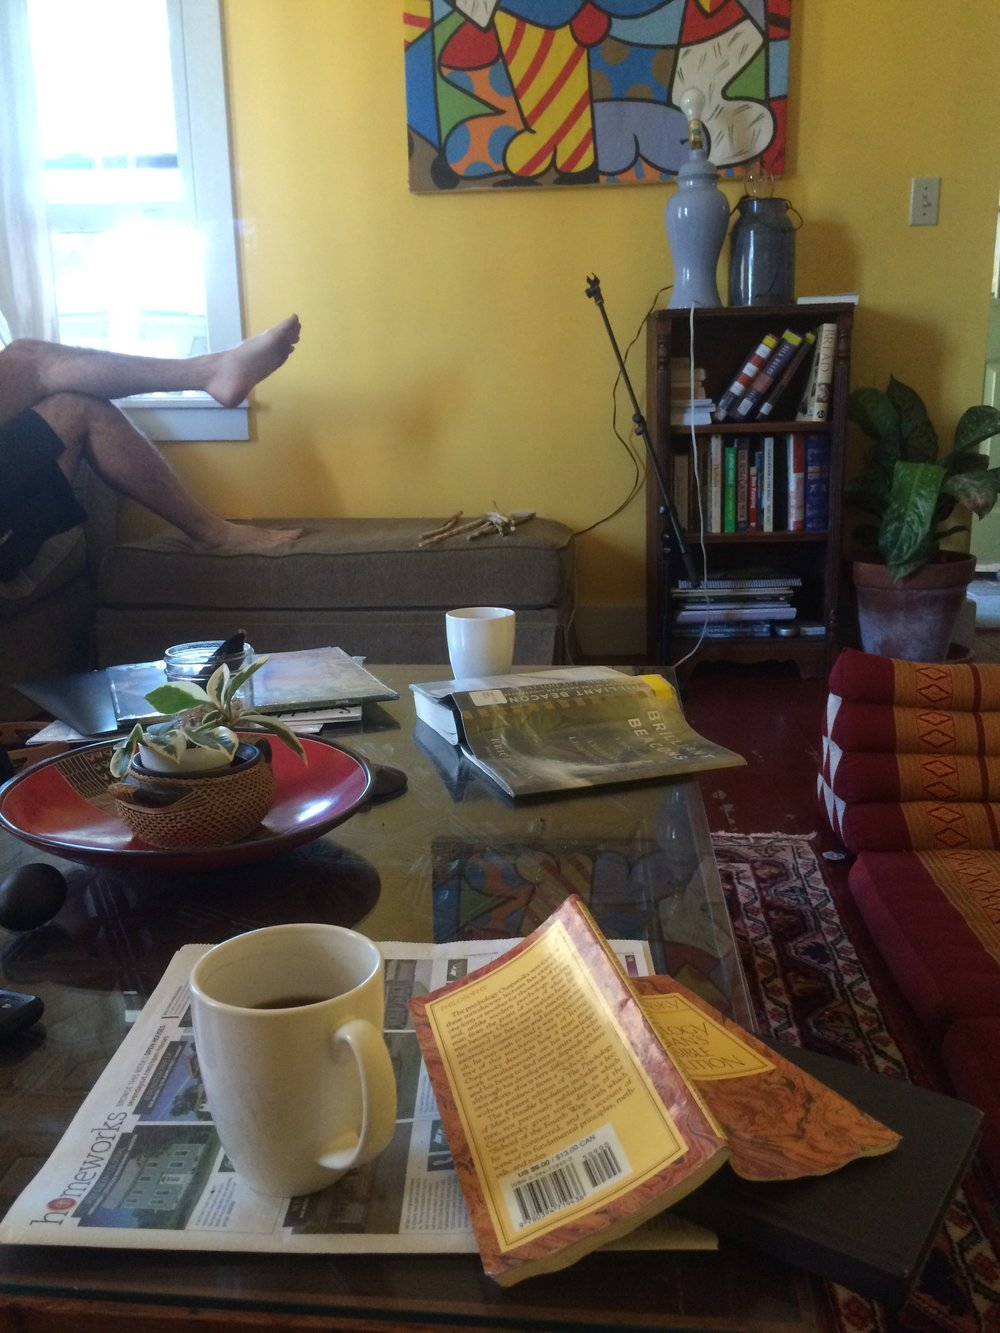 Hot coffee, plants and Ram Narayam records